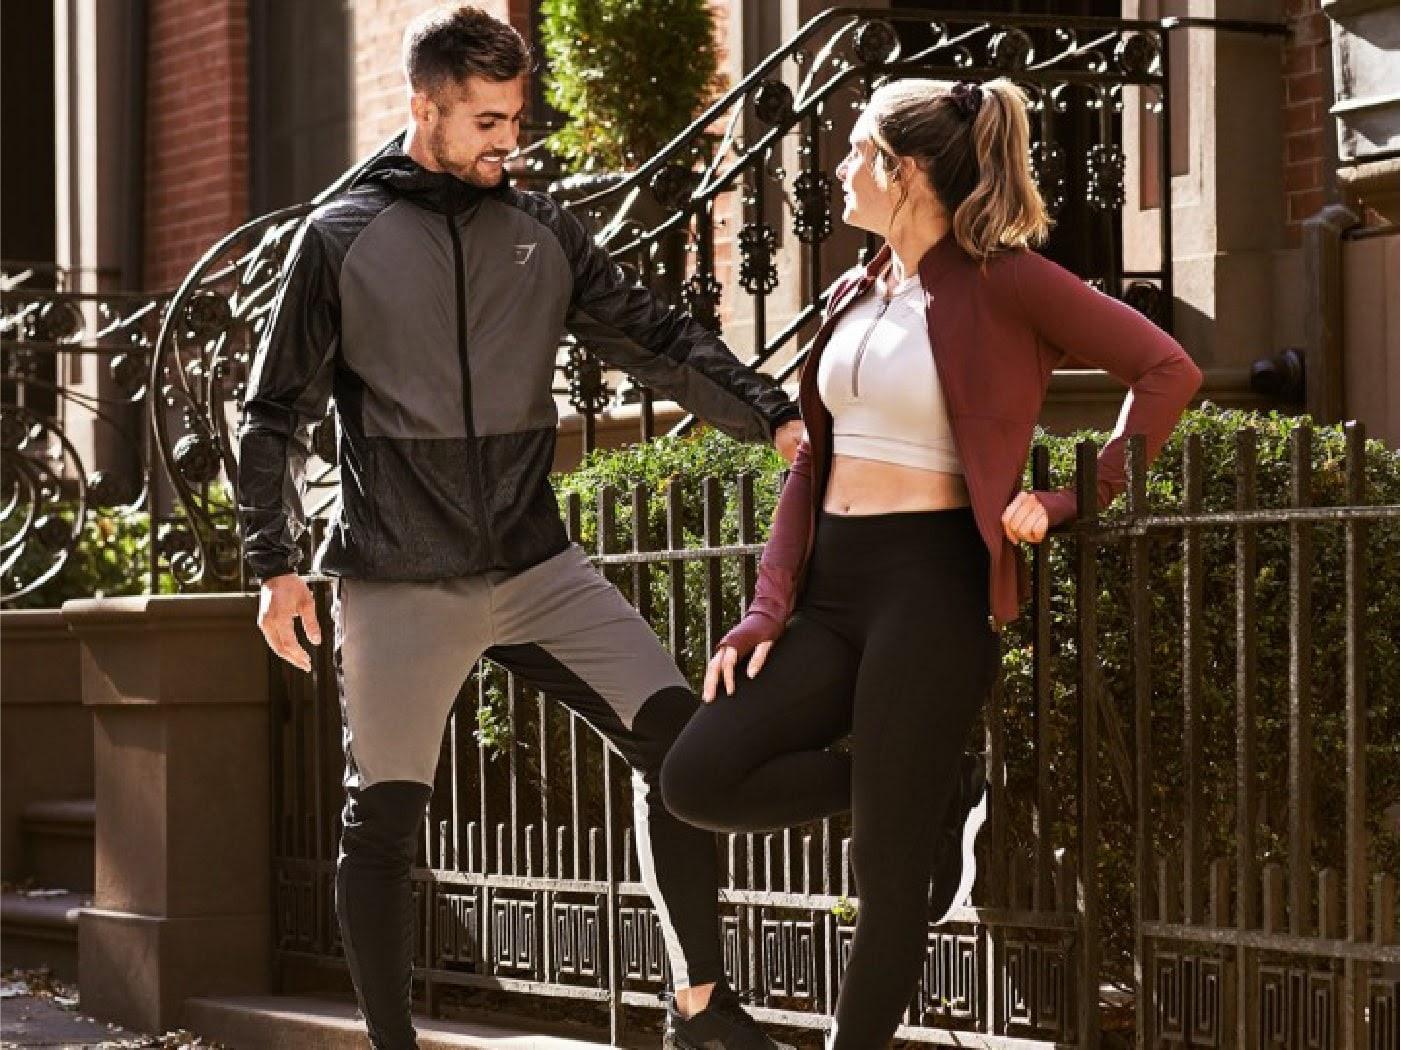 People wearing gym shark clothing